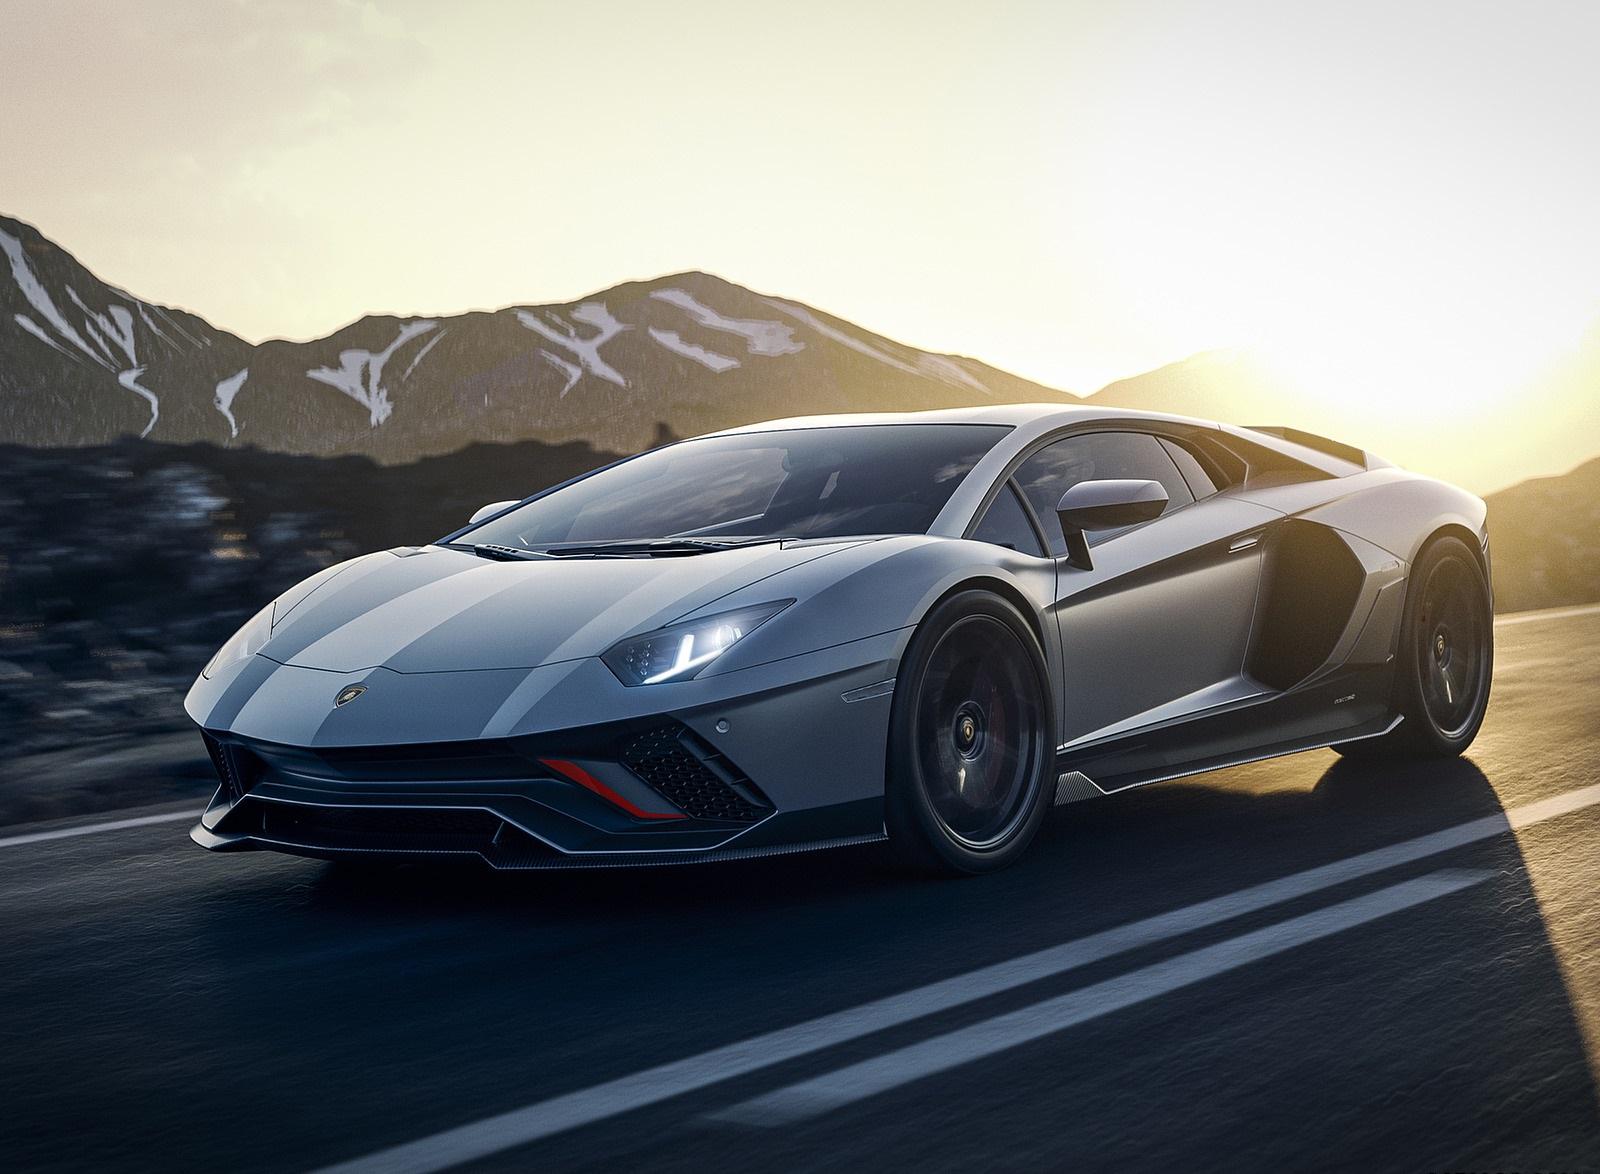 2022 Lamborghini Aventador LP 780-4 Ultimae Front Three-Quarter Wallpapers (1)